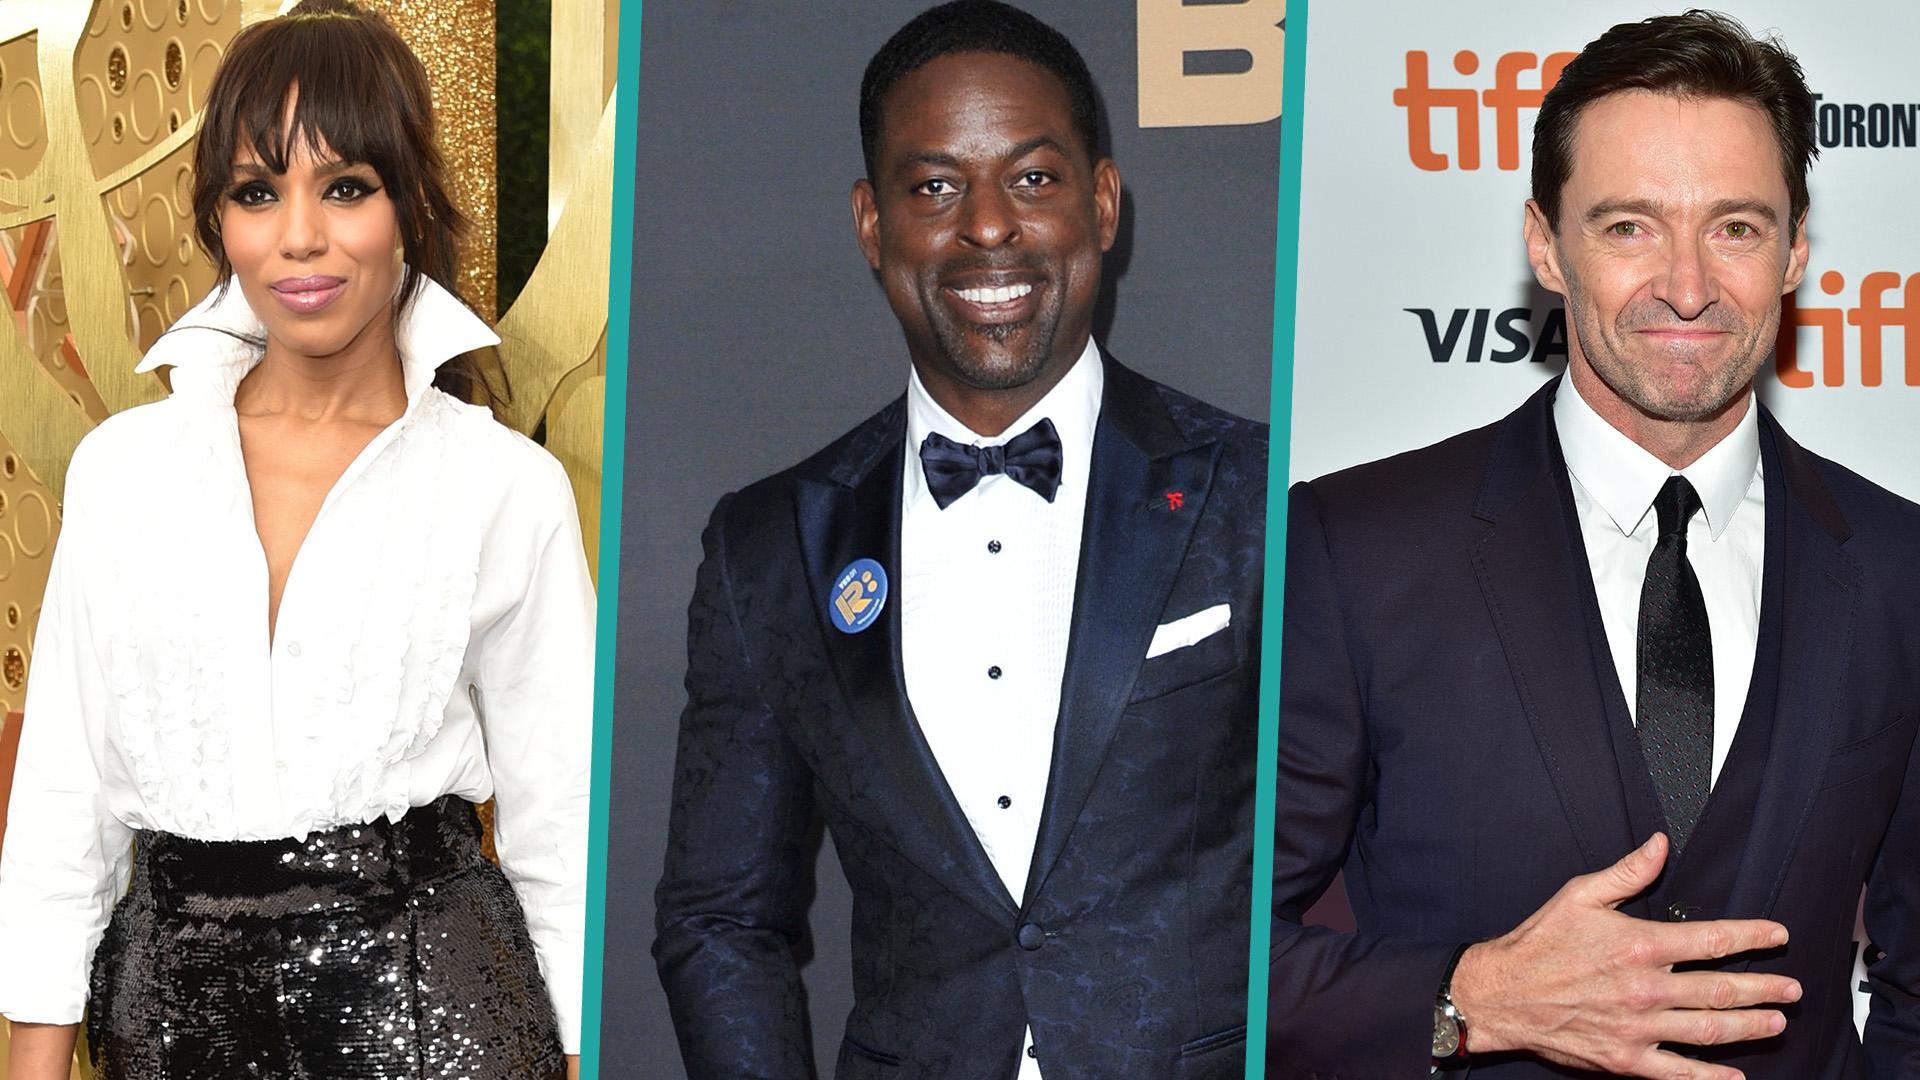 Hugh Jackman on his Emmy nom and Ryan Reynolds: 'He's devastated'